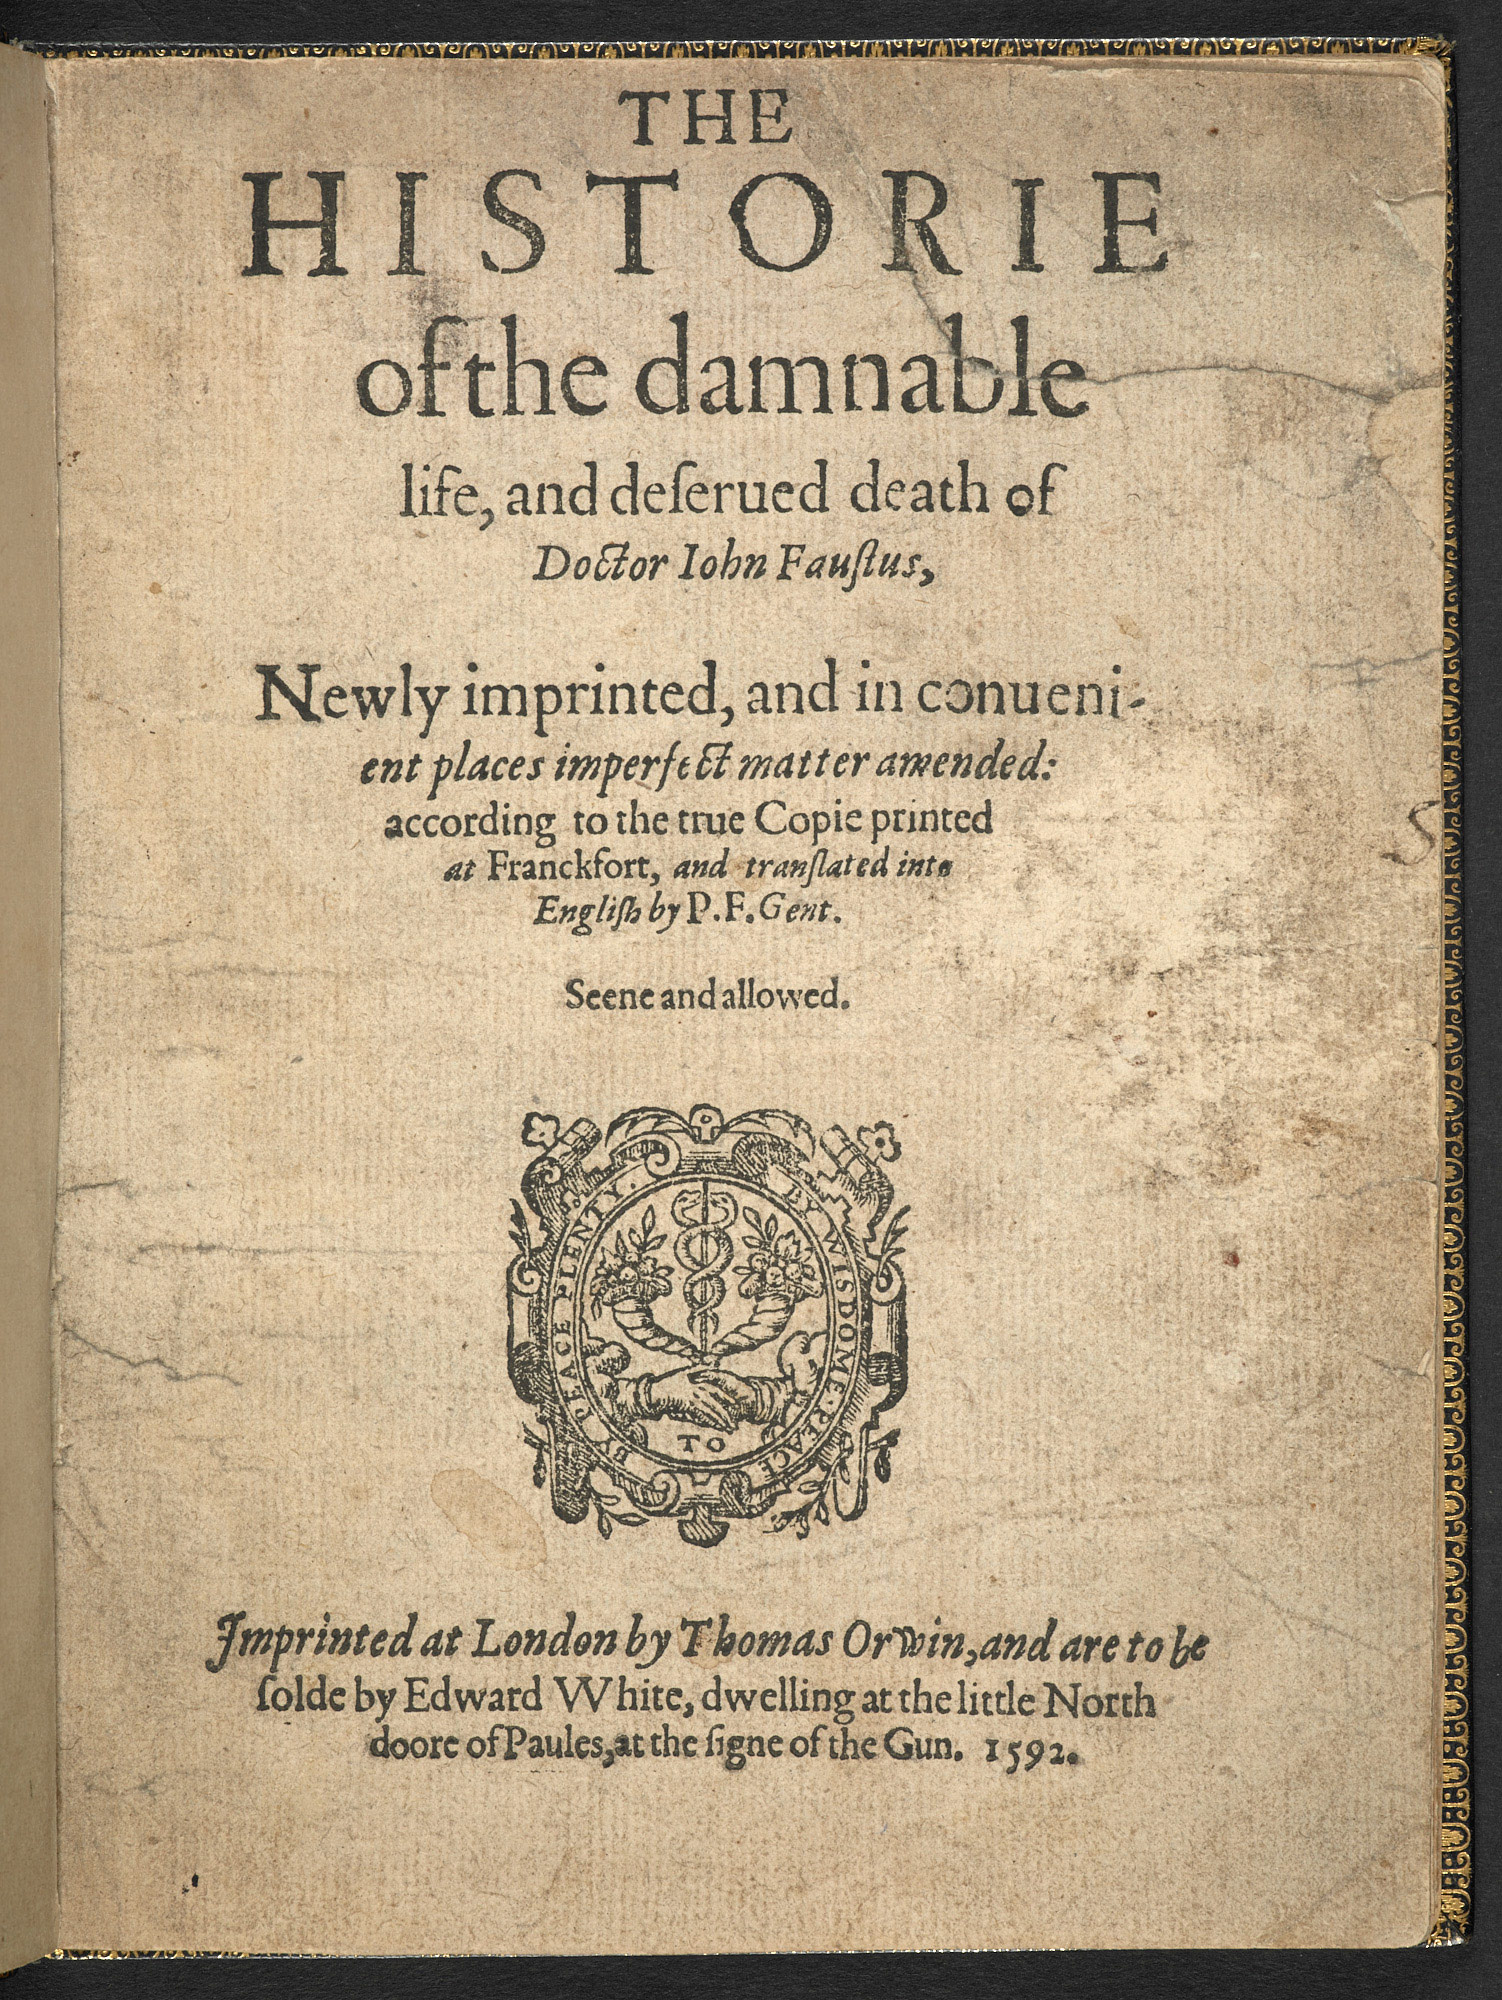 The English Faustbuch, 1592